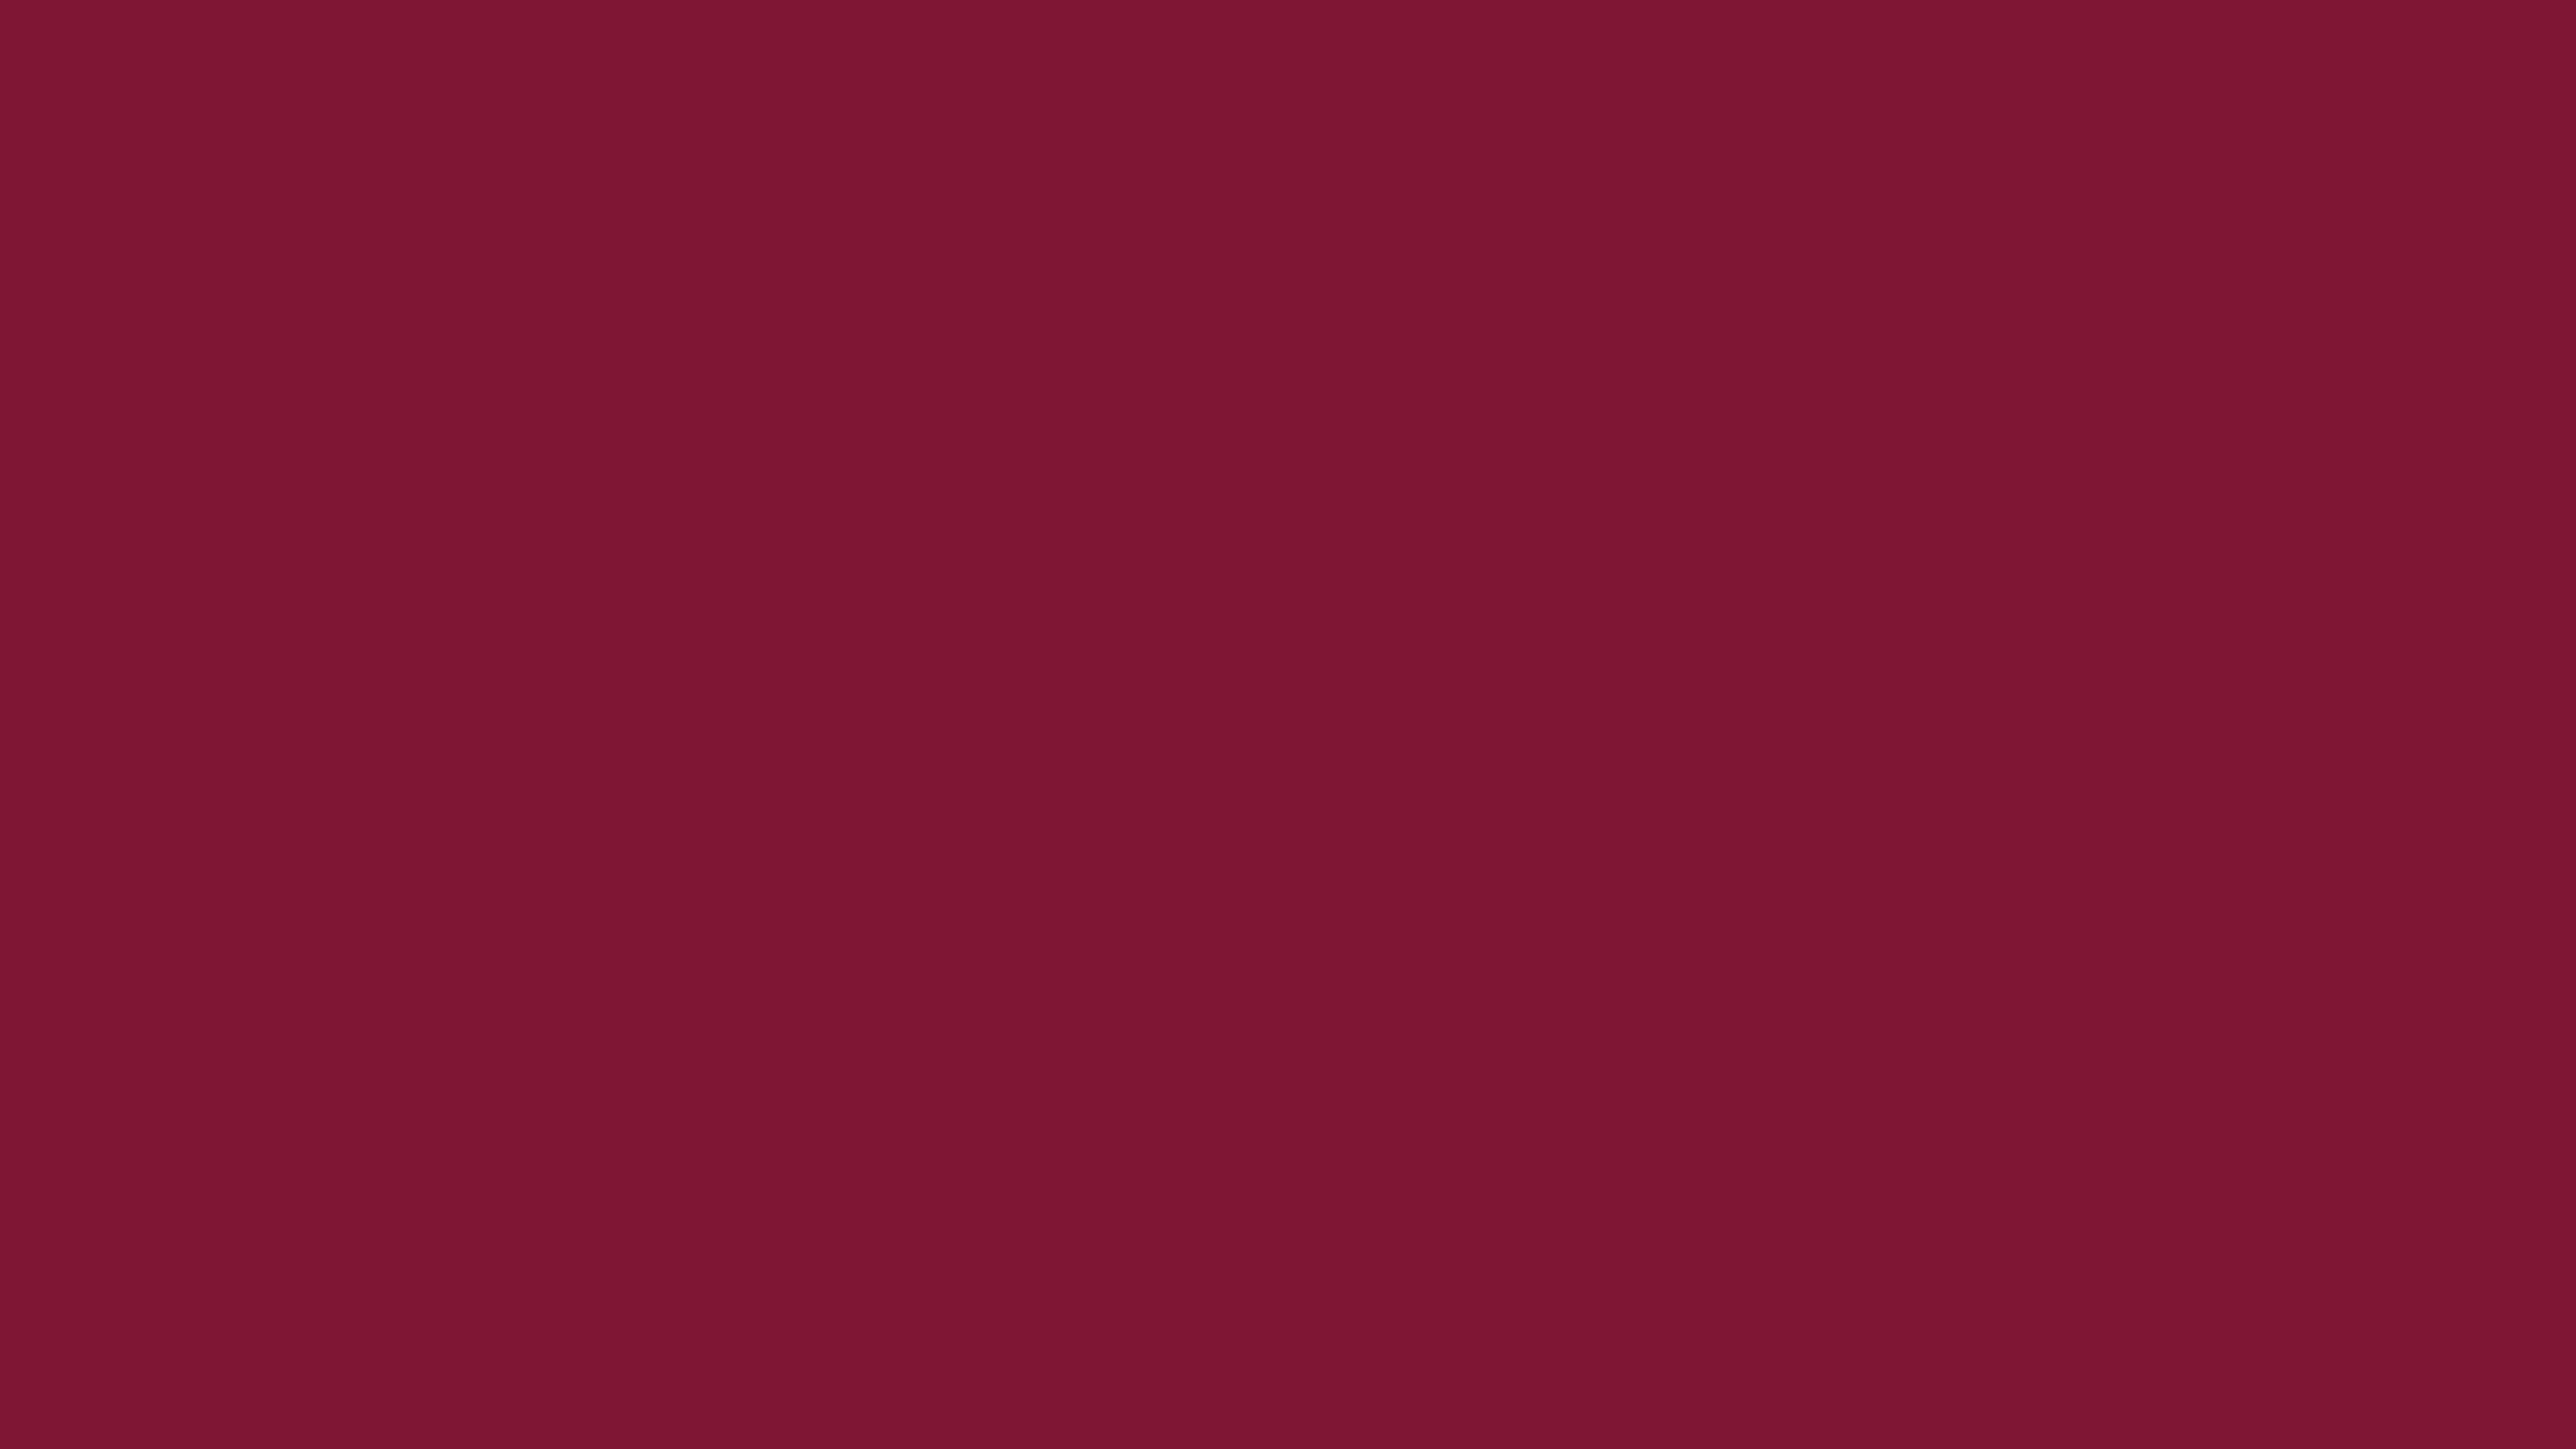 5120x2880 Claret Solid Color Background